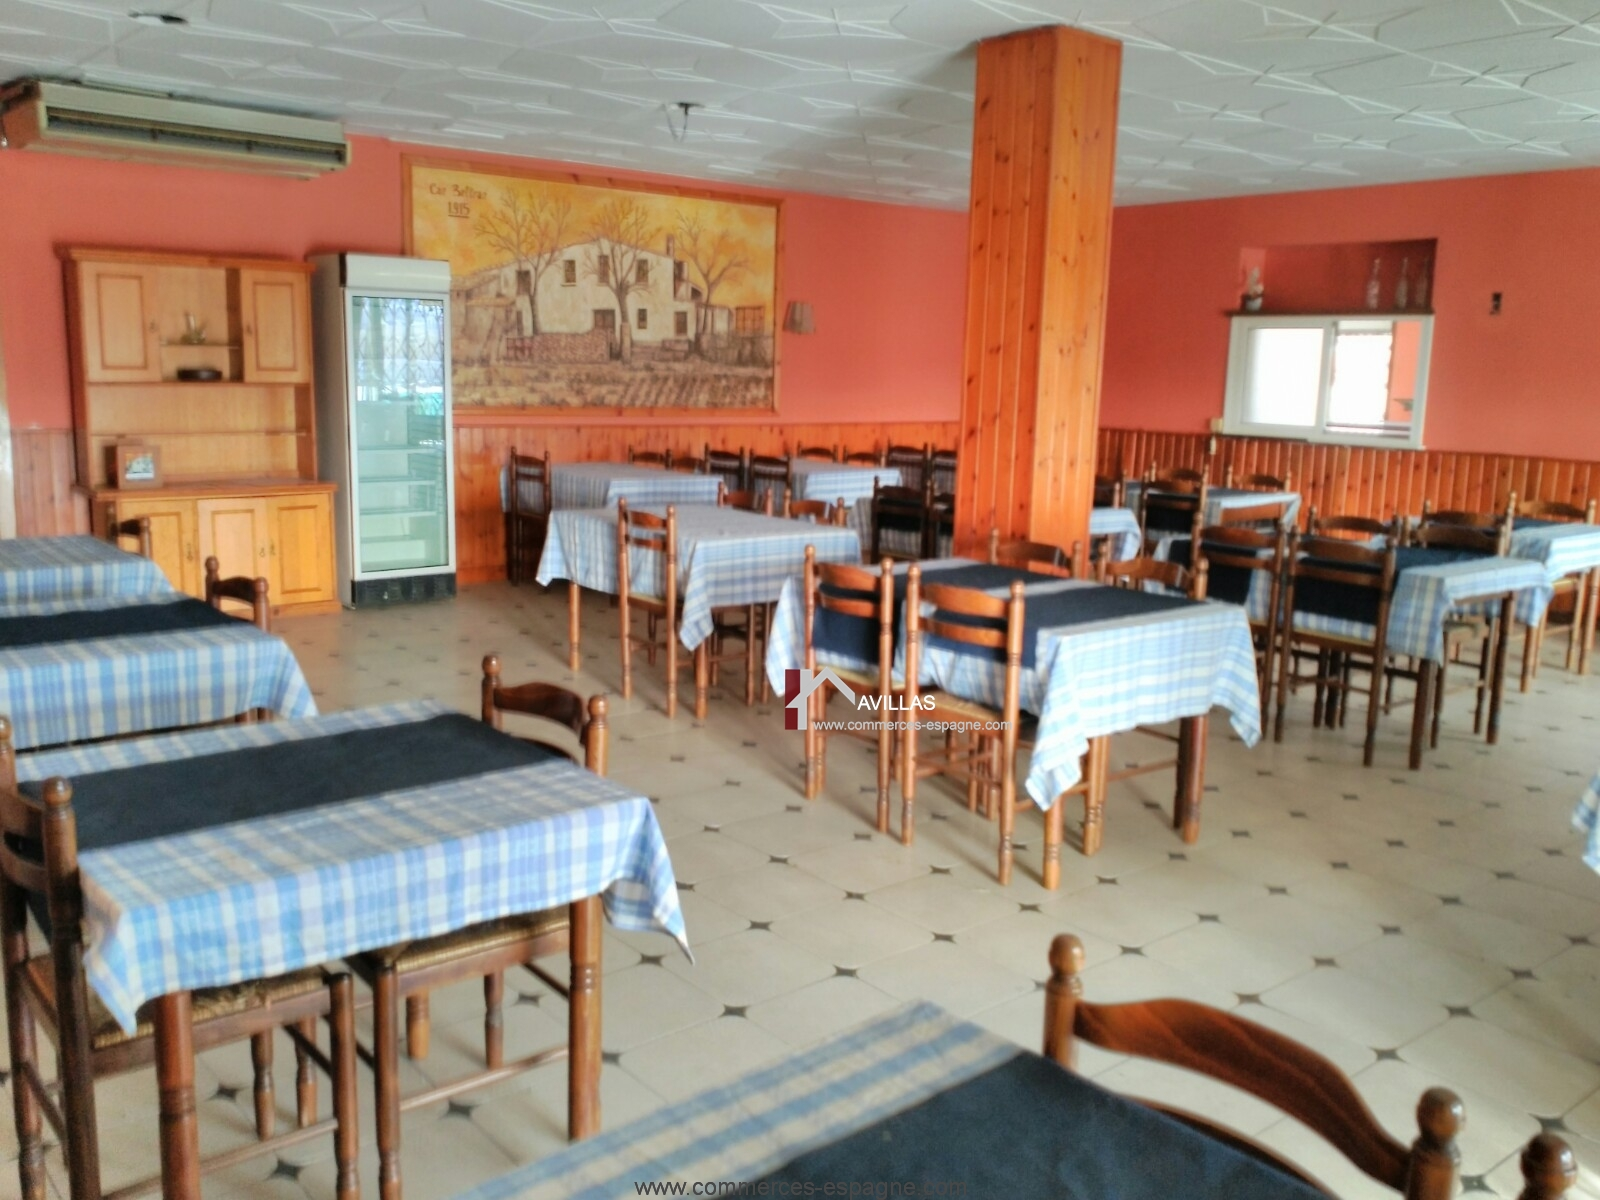 Tordera, Bar Restaurant avec appartement 5 chambres